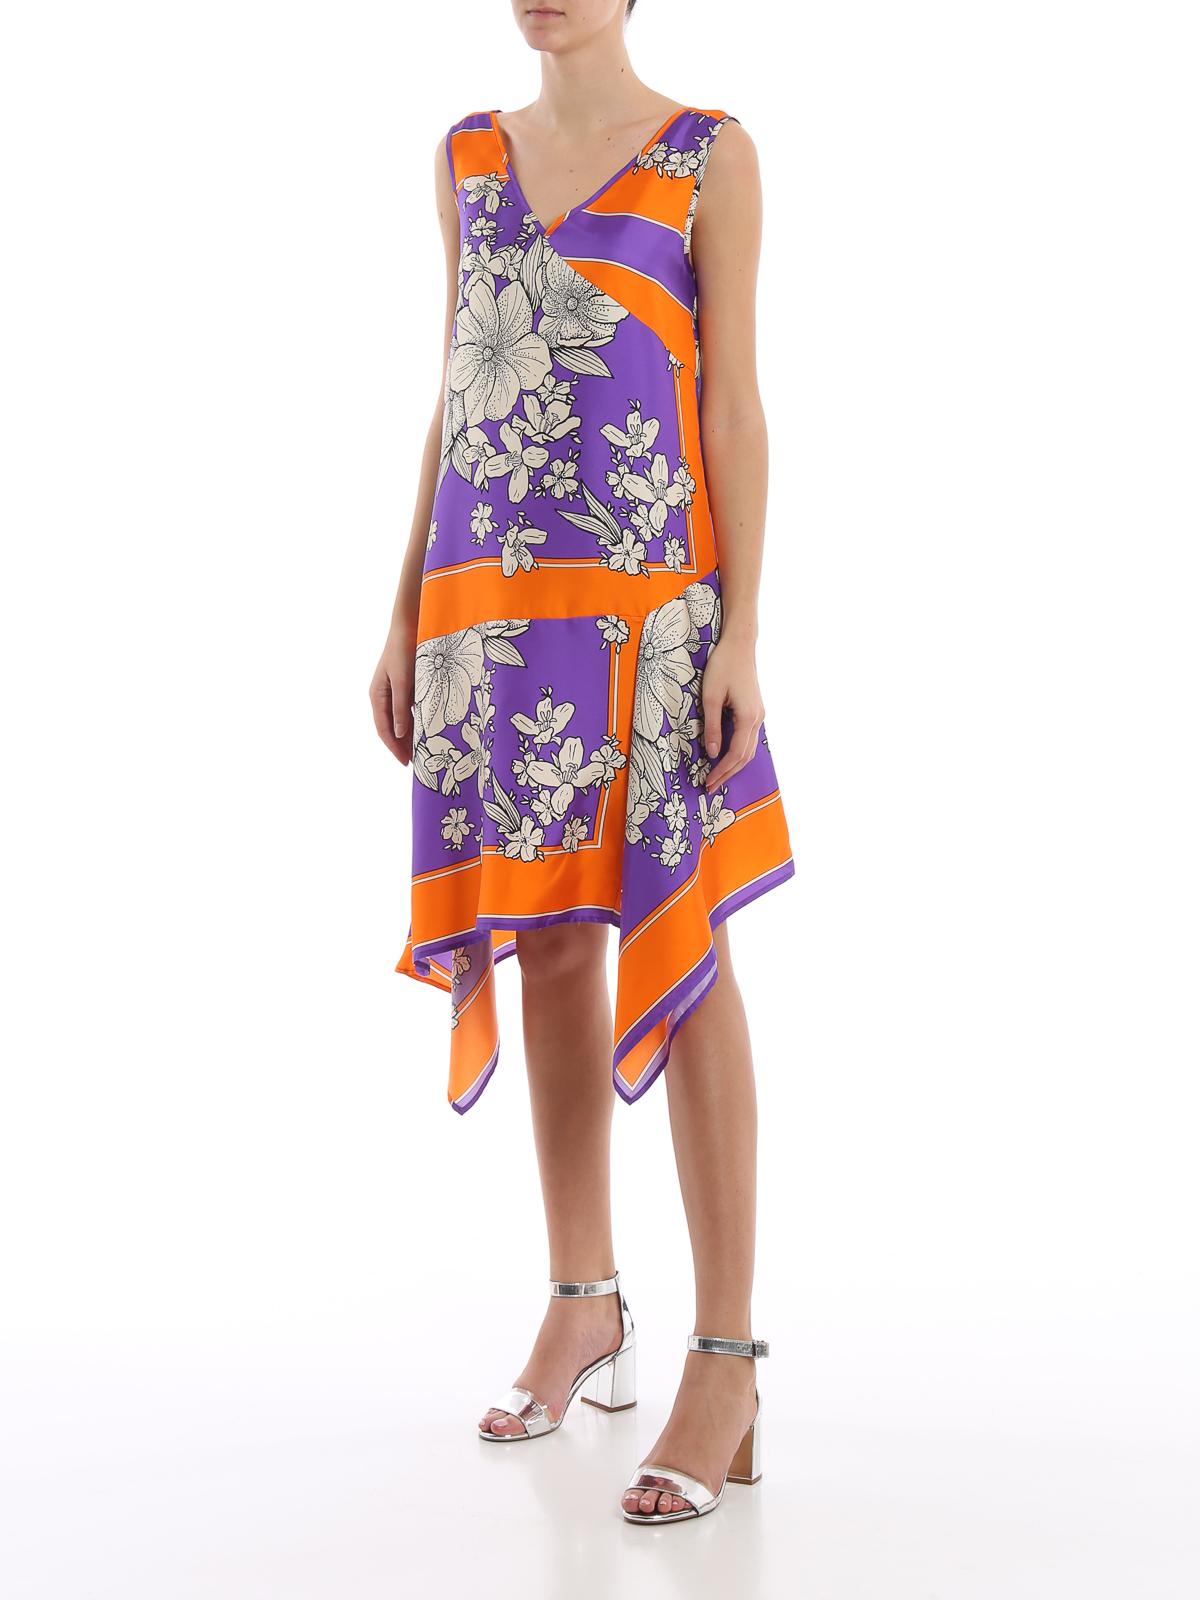 r Dress Asymmetric a Length Salto Knee Floral o P Silk s h g5zw77xO